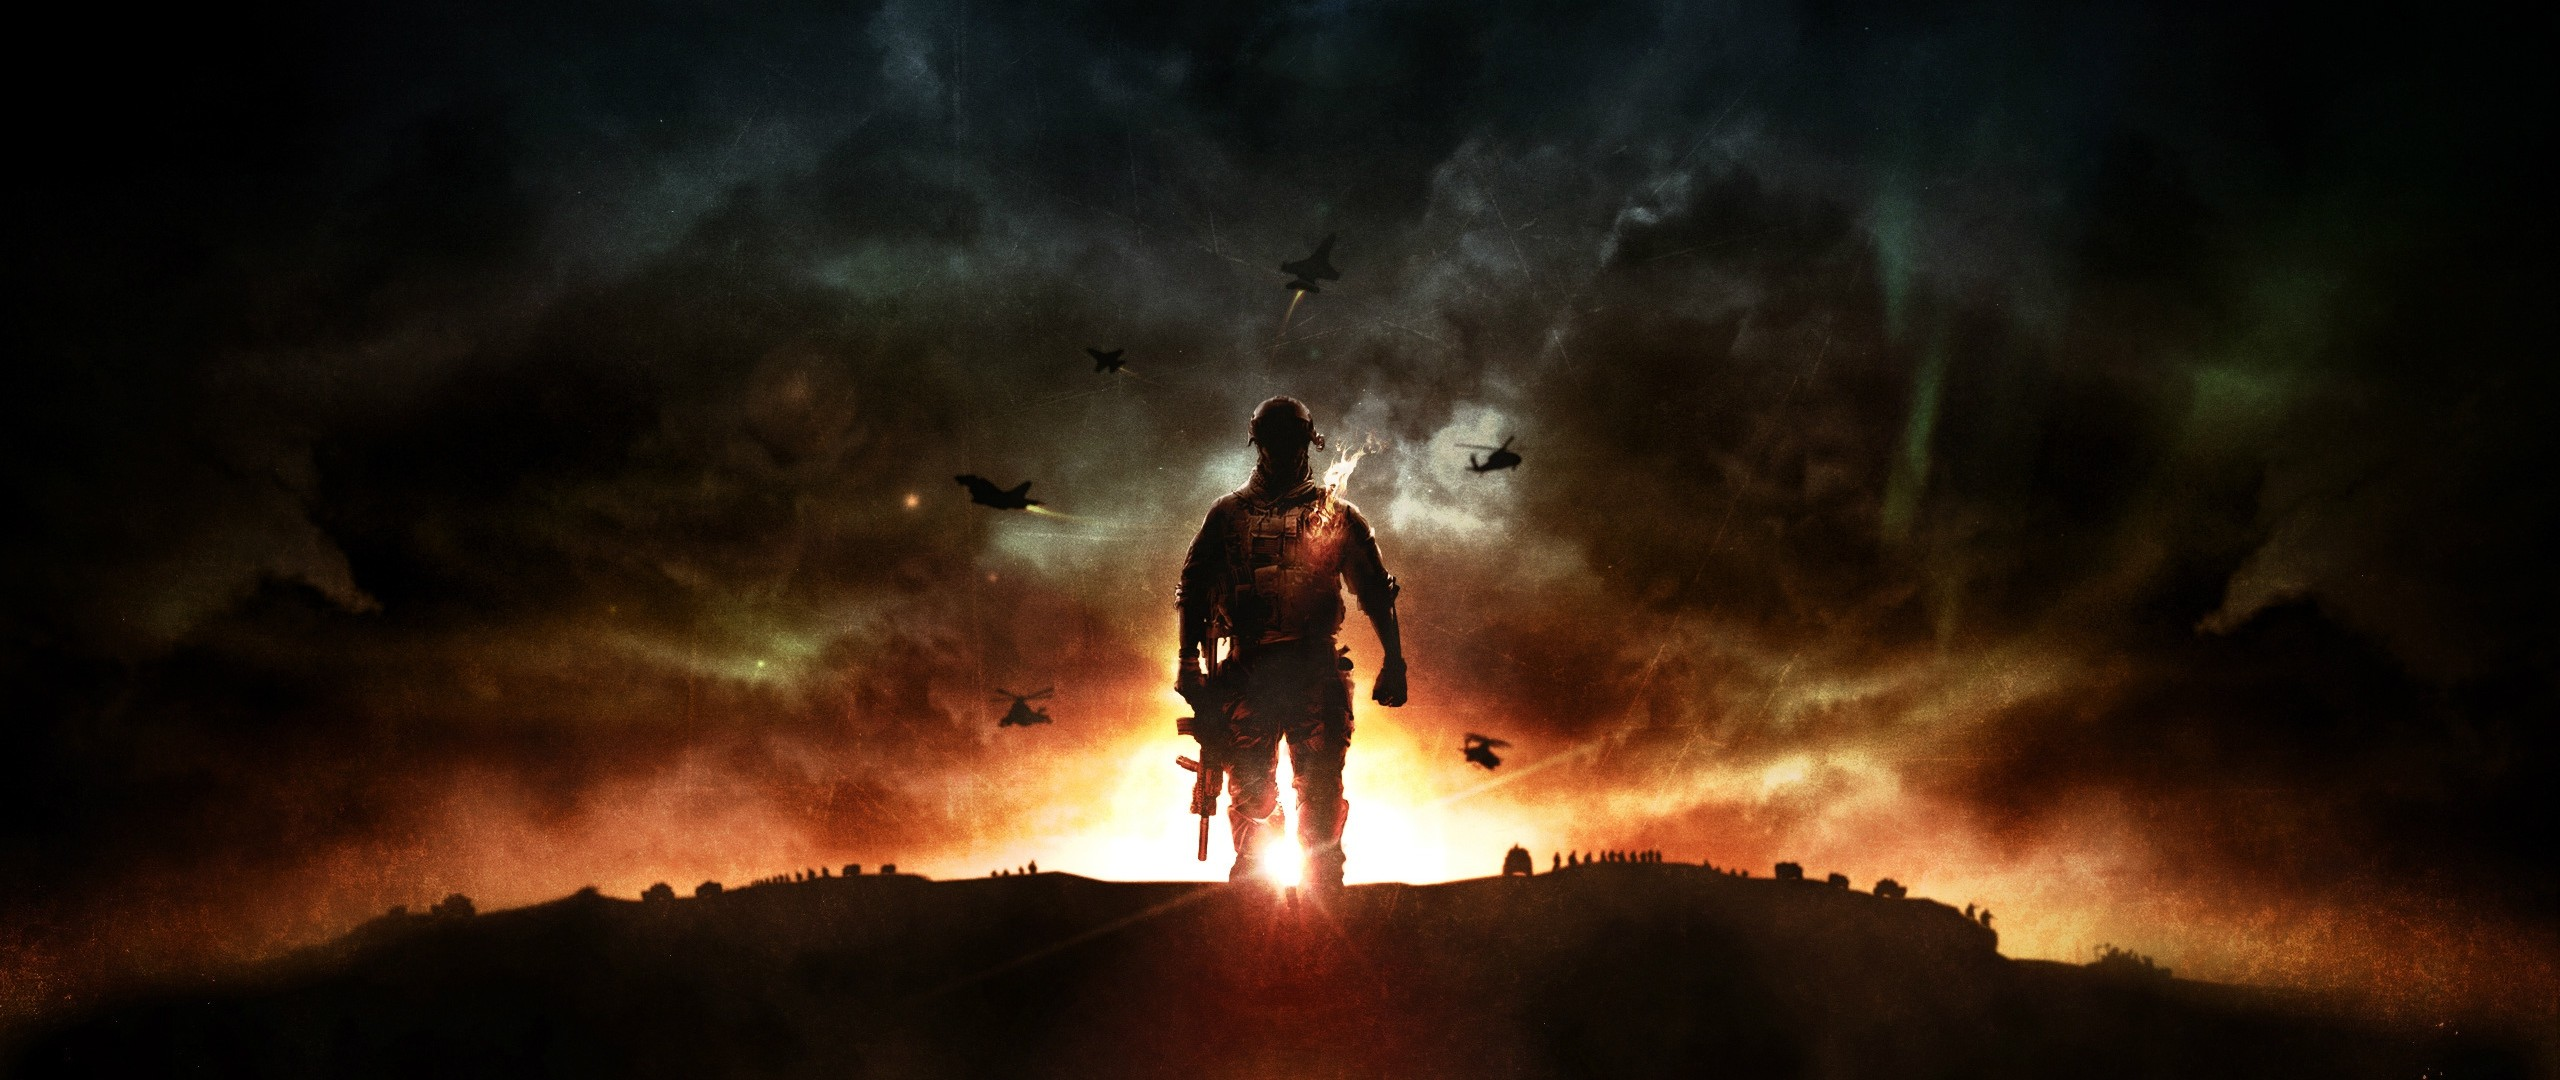 Preview wallpaper battlefield 4, game, explosion, ea digital illusions ce  2560×1080